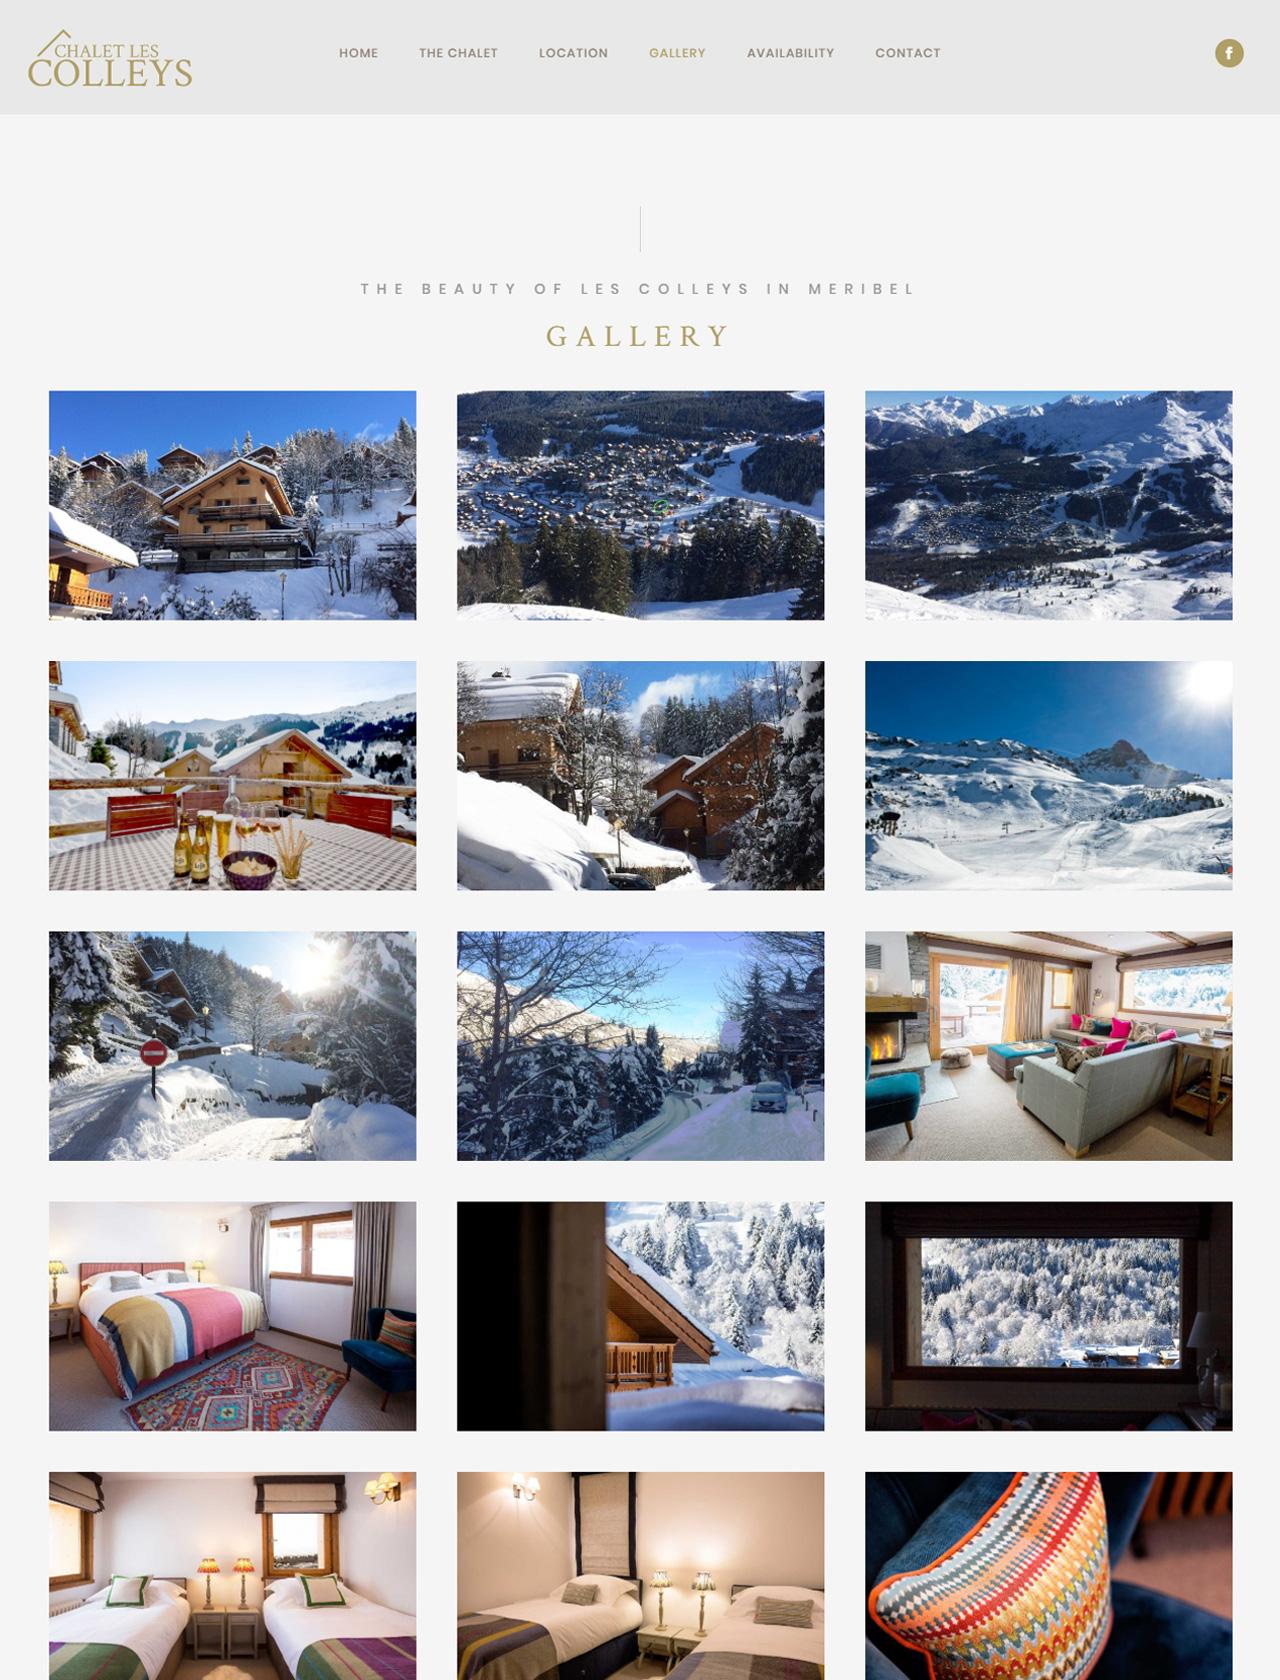 chalet in meribel website gallery page